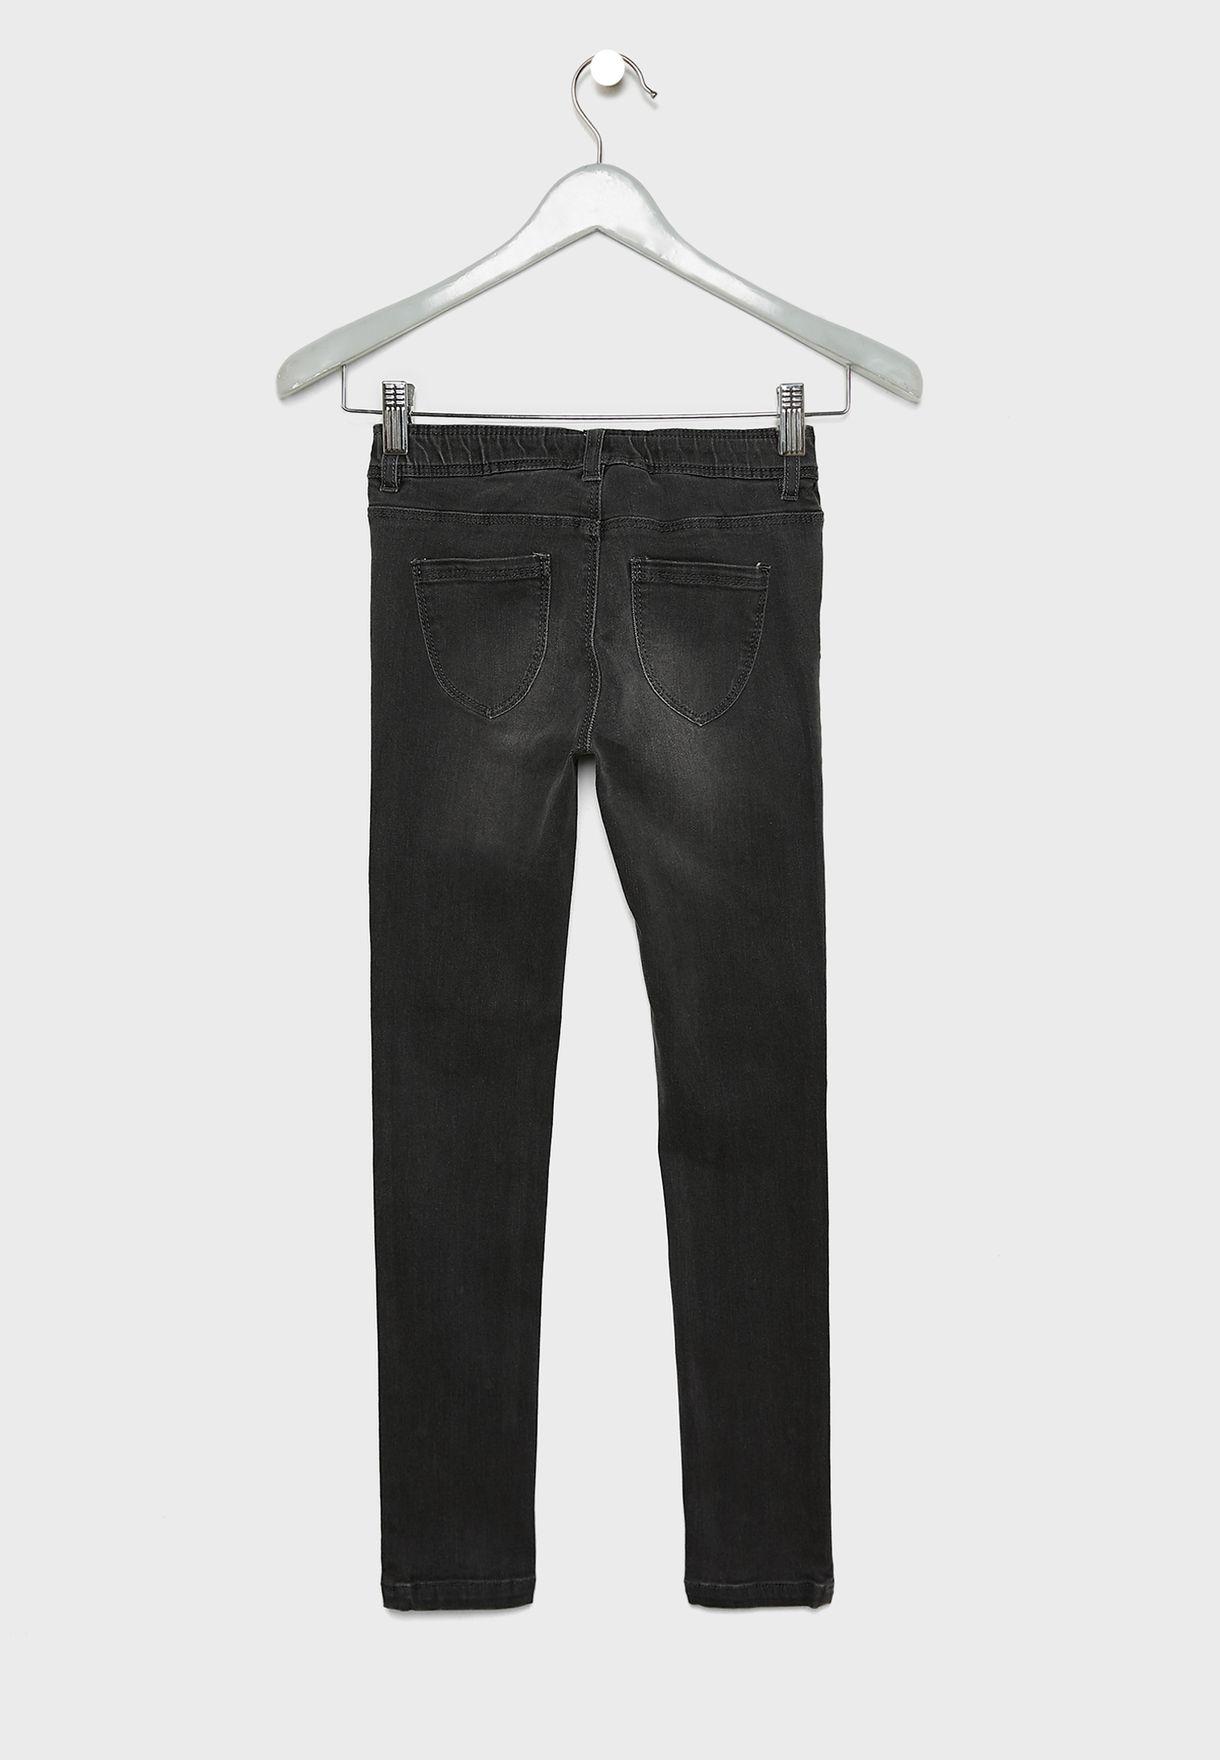 جينز مزين باللؤلؤ